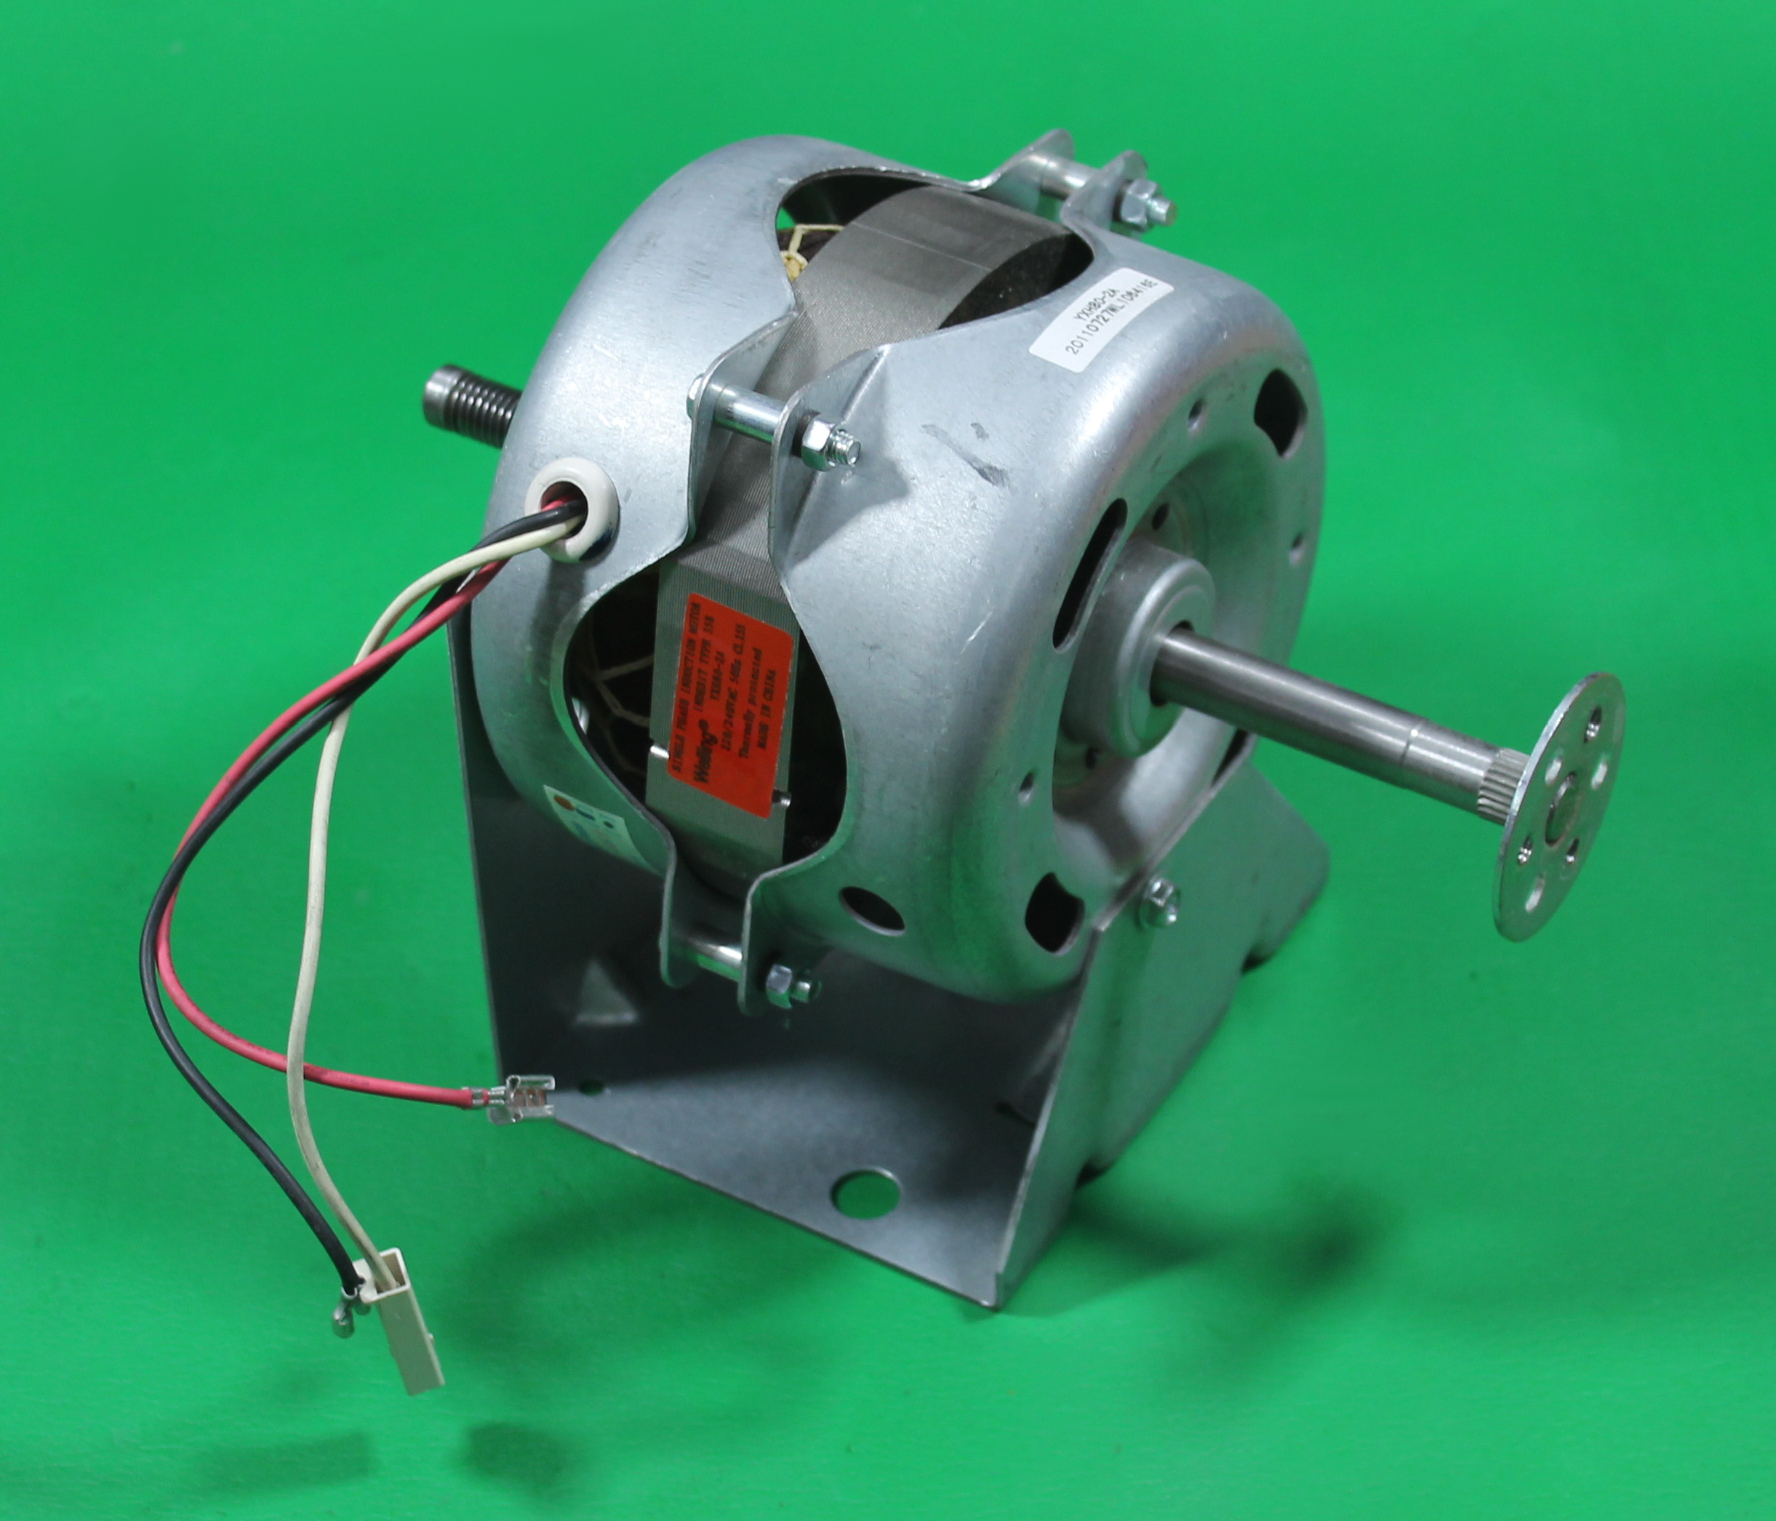 Hotpoint Tvm570 Tumble Dryer Motor Welling Yxh80 2a Ebay